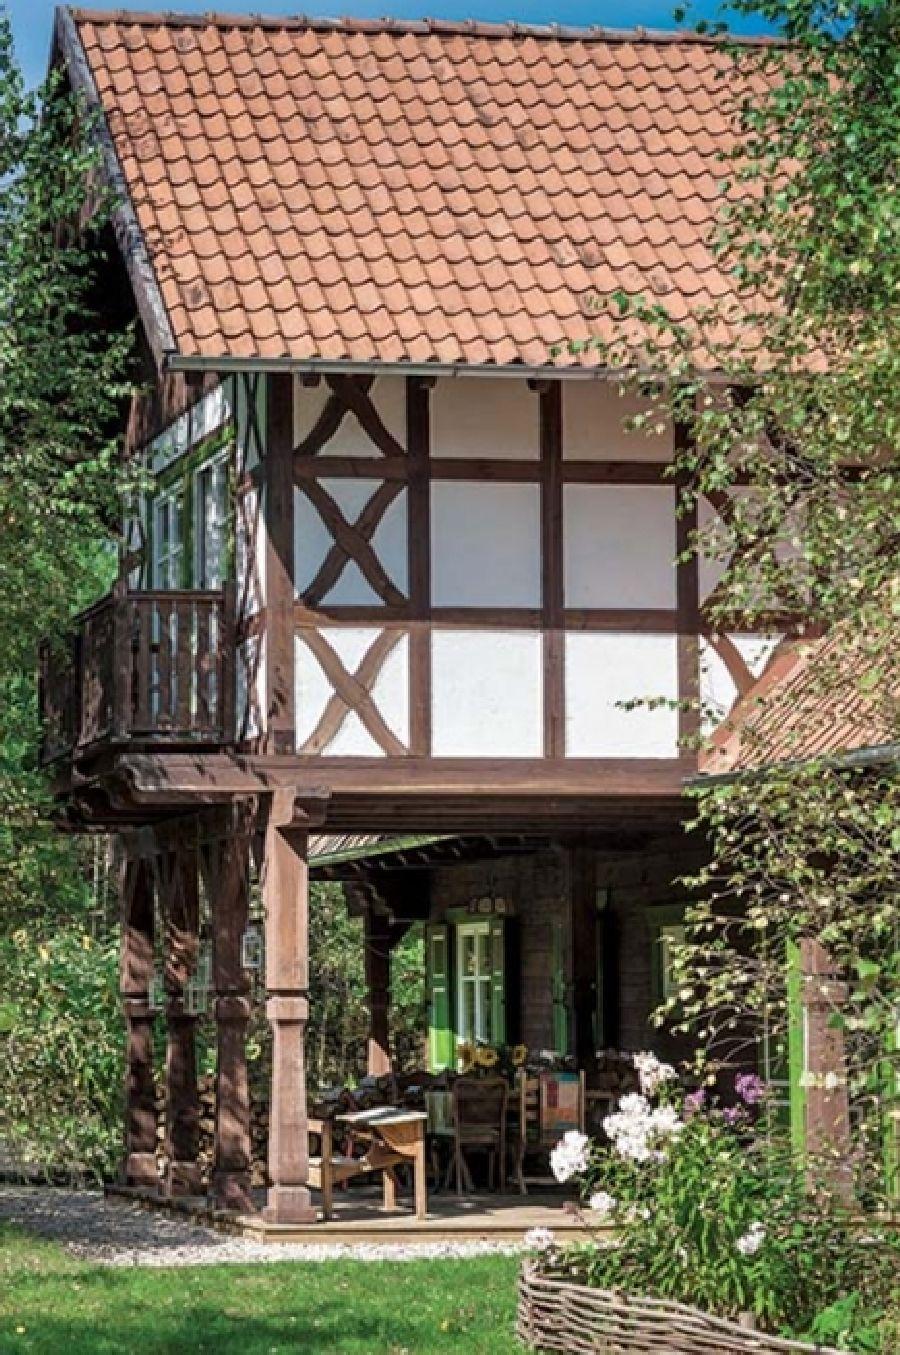 adelaparvu.com despre casa din lemn, csa si pensiune Polonia, Kolonia Mazurska Mierki (18)